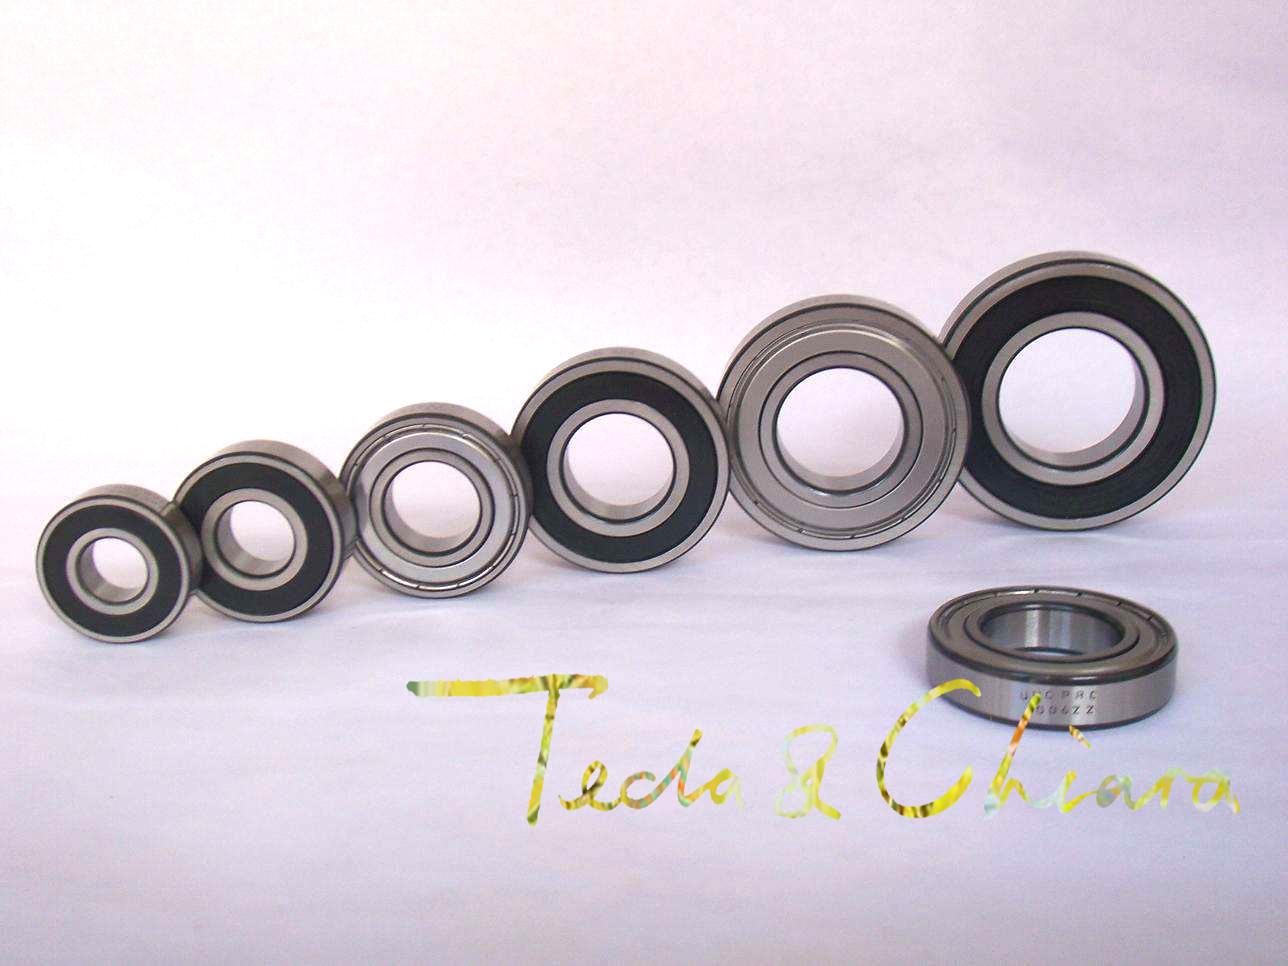 6003 6003ZZ 6003RS 6003-2Z 6003Z 6003-2RS ZZ RS RZ 2RZ Deep Groove Ball Bearings 17 x 35 x 10mm High Quality цена